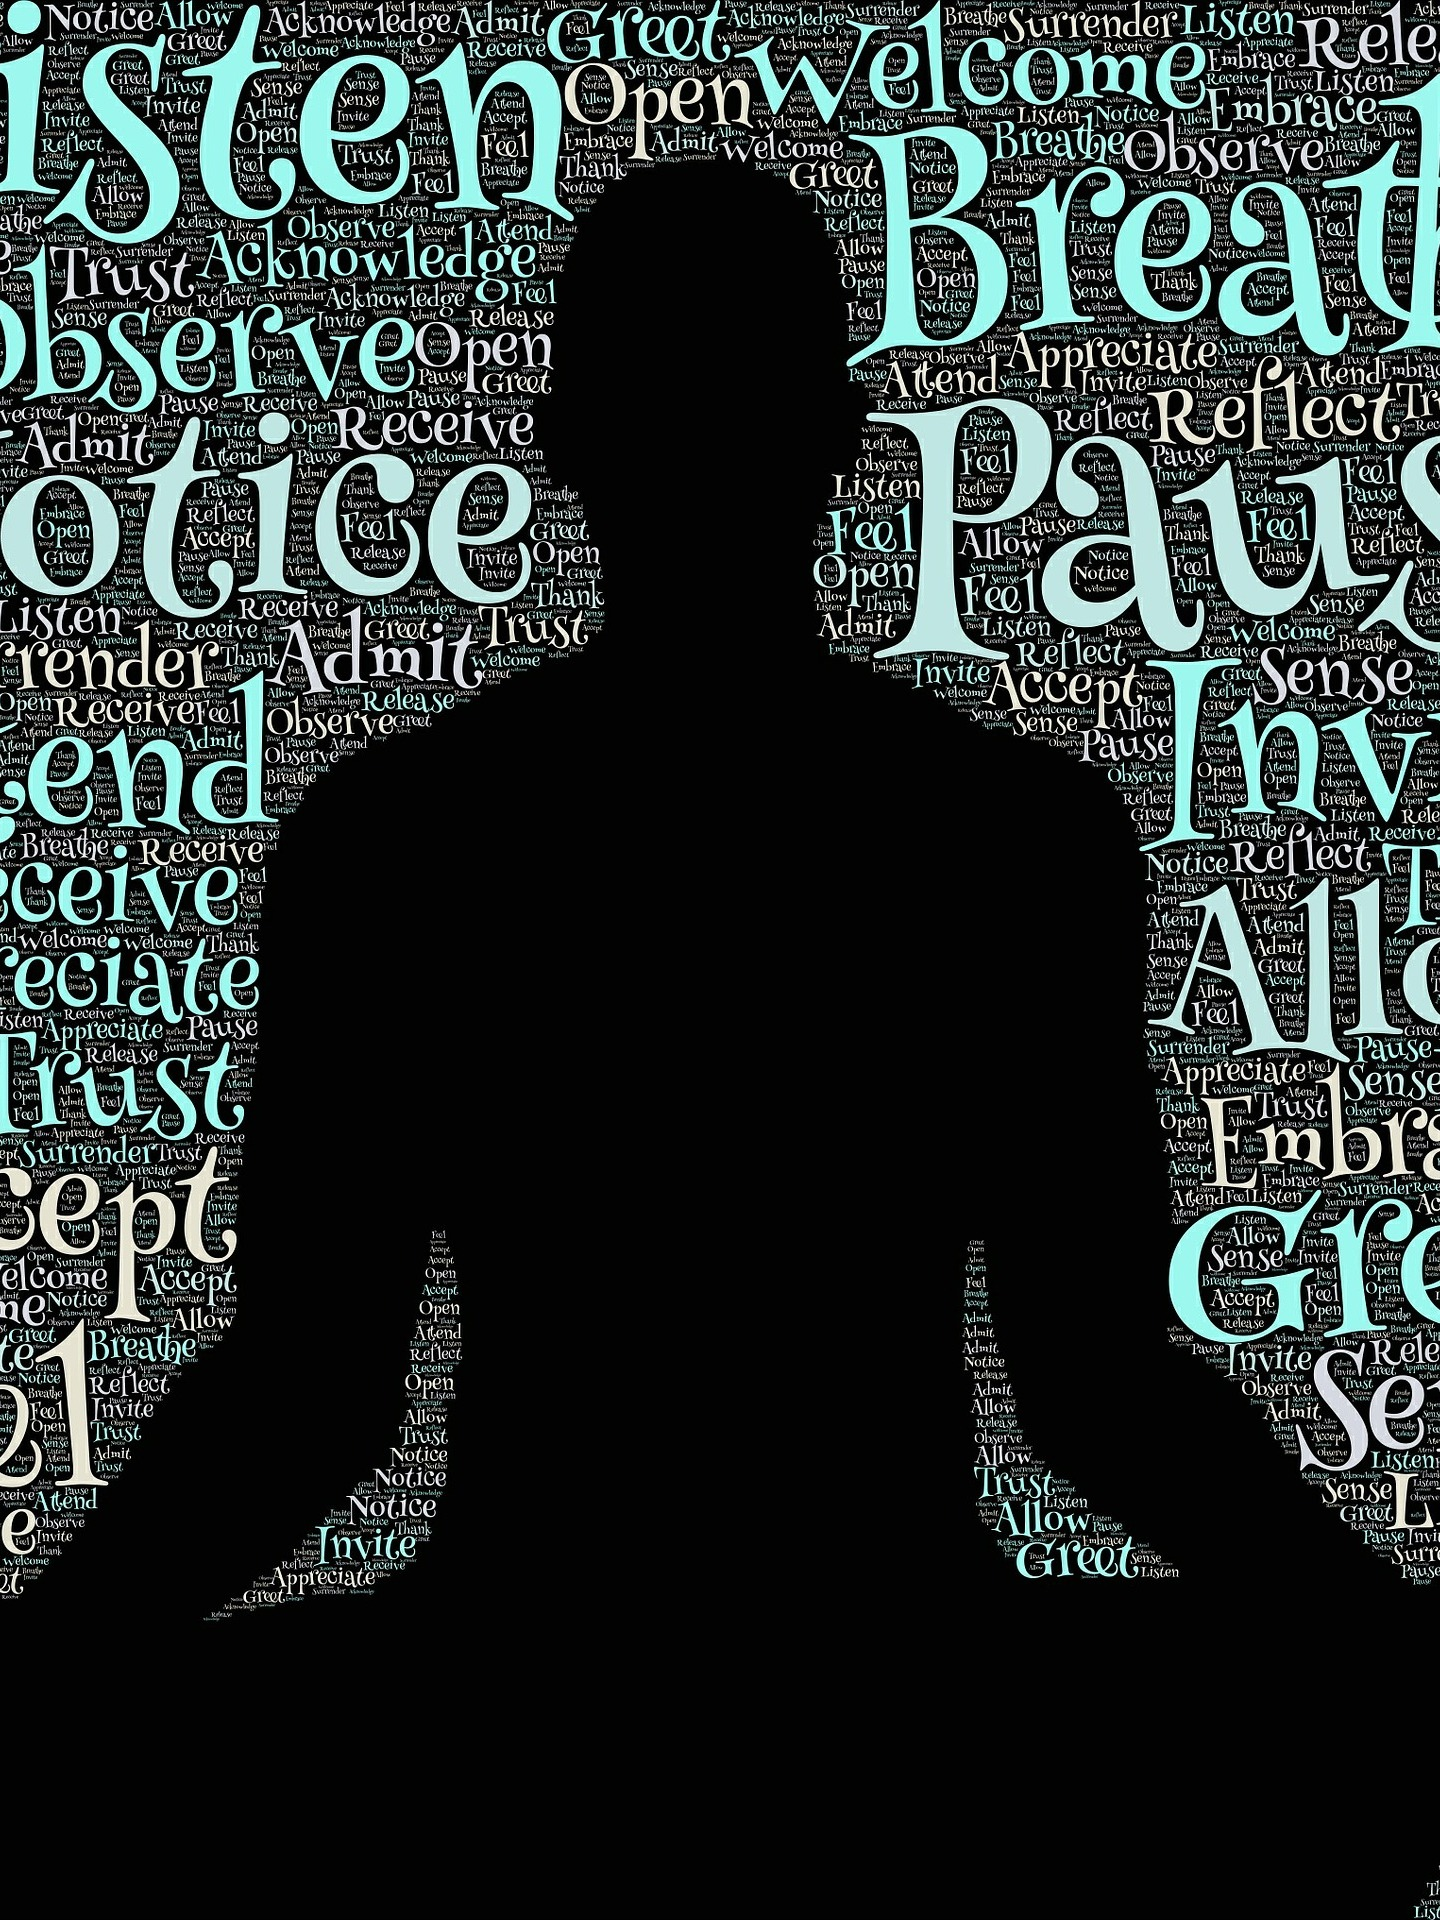 yoga-422196_1920_1557163622467.jpg